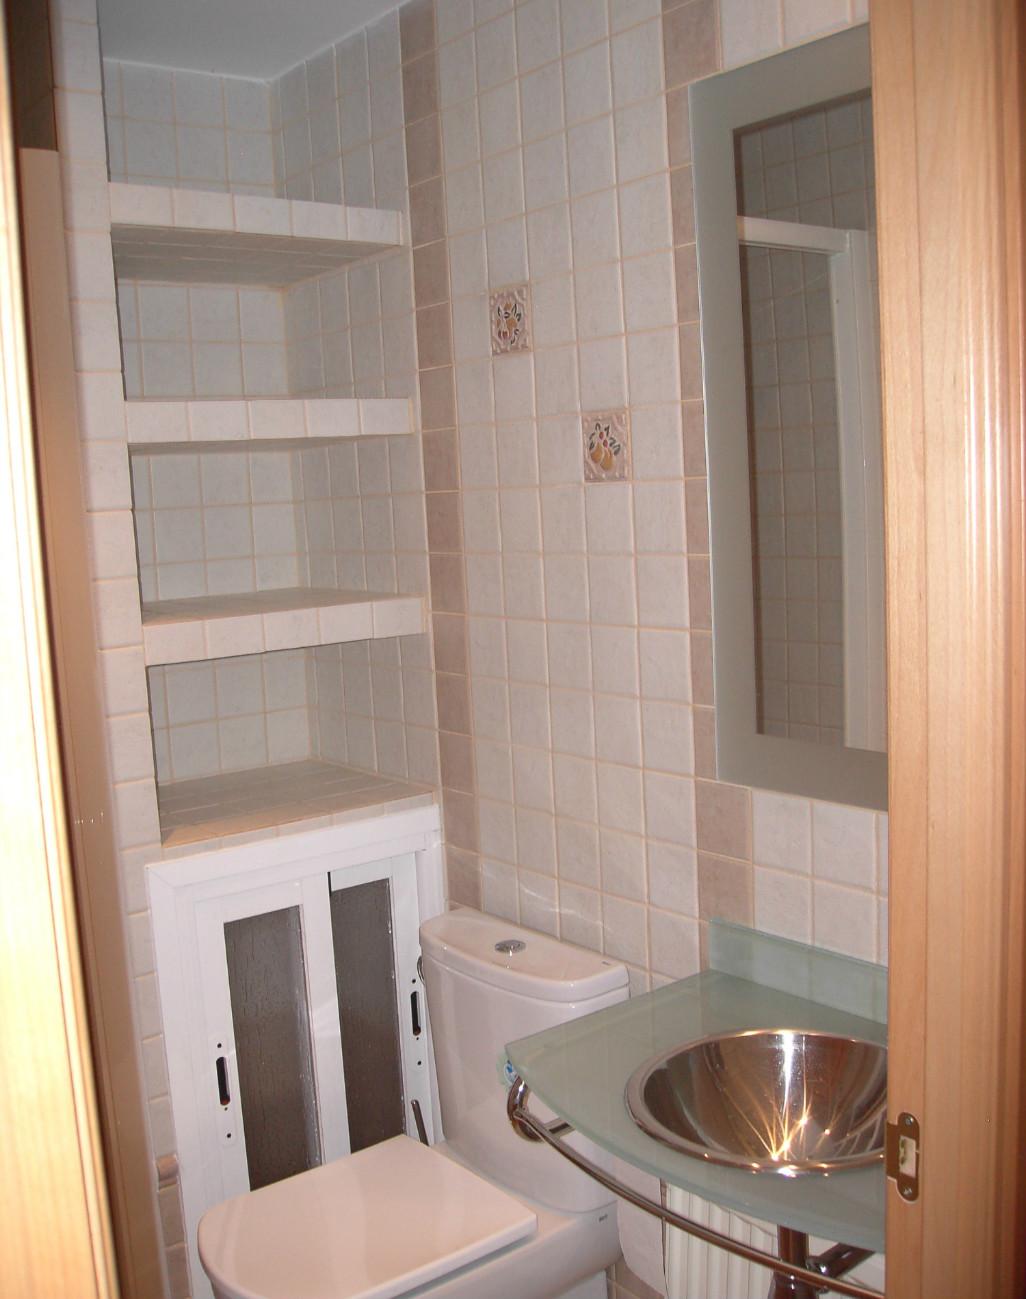 Ba o con azulejo peque o reformark - Estantes para interior ducha ...